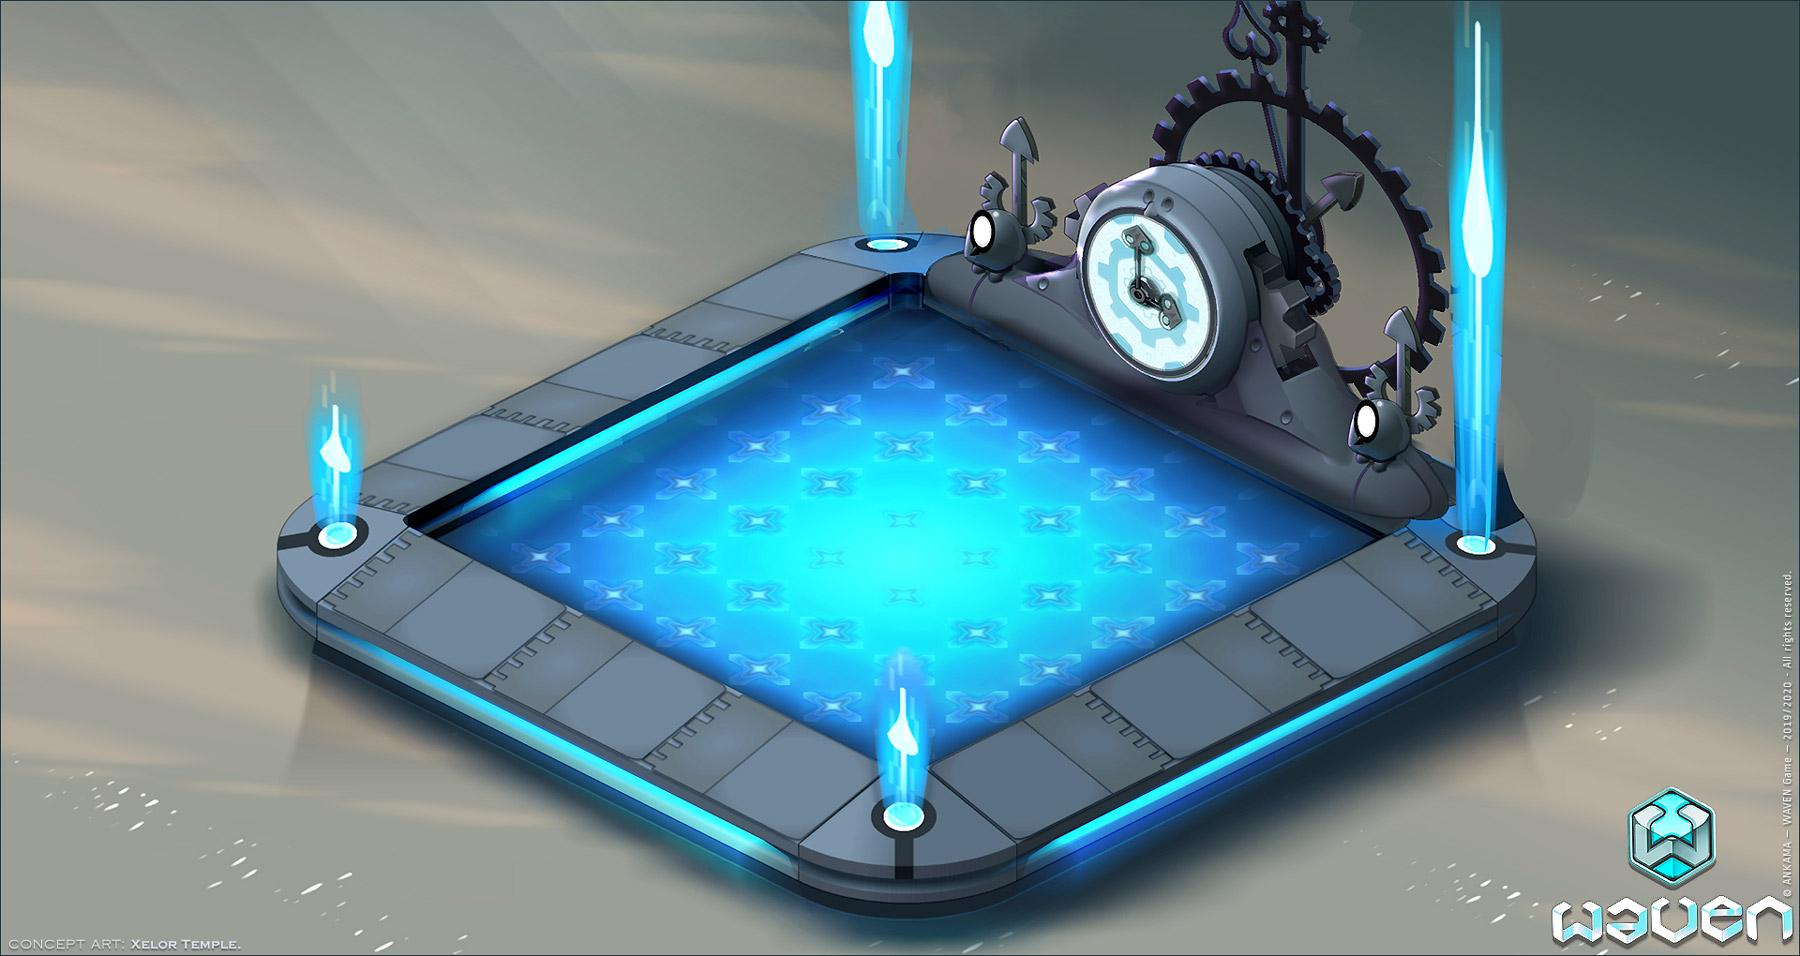 WAVEN Game - Concept Art Background - Xelor Temple.